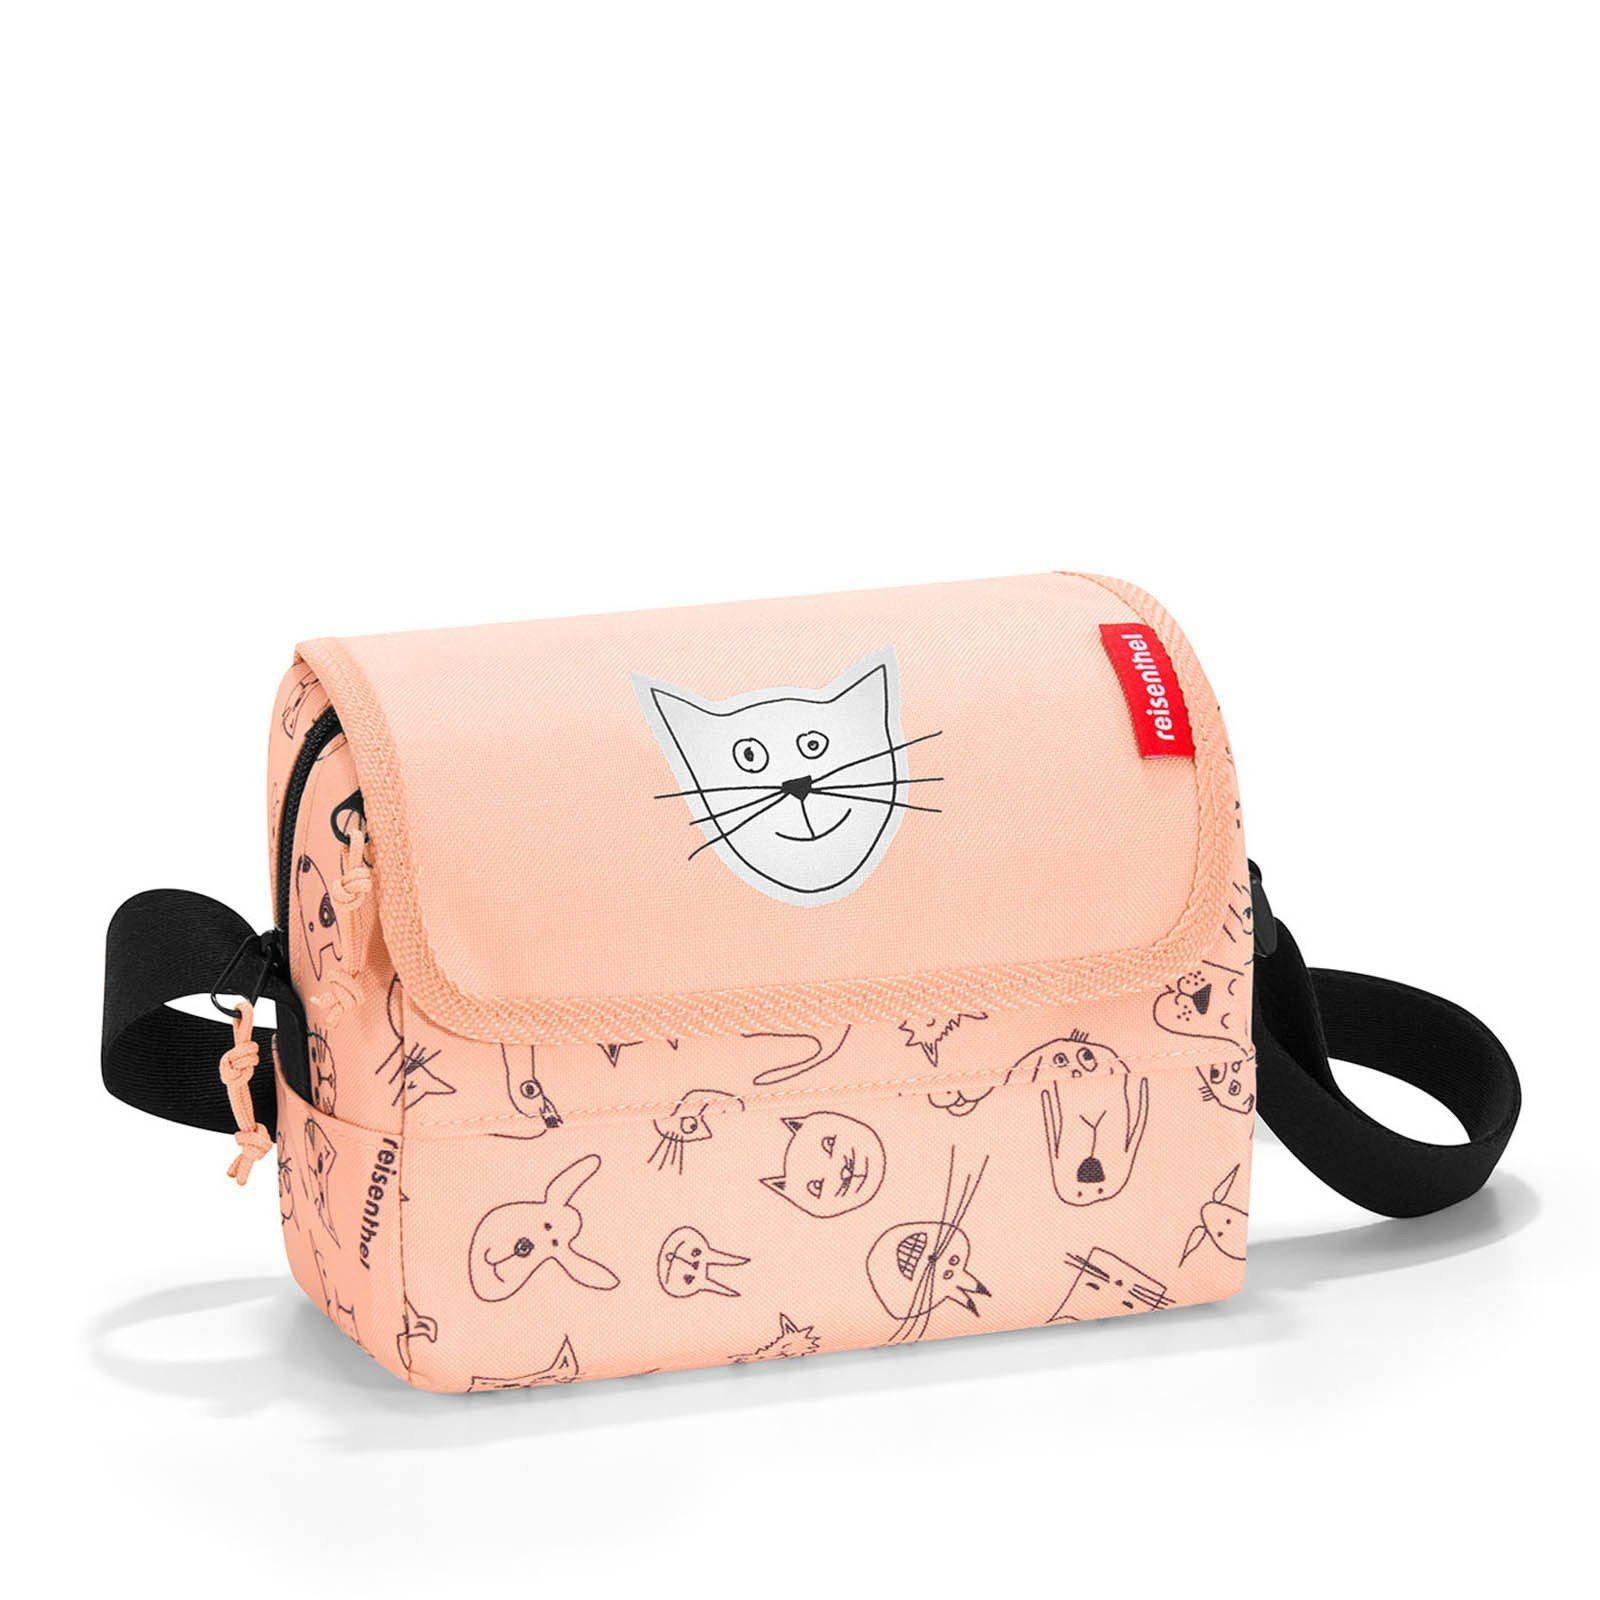 REISENTHEL® Umhängetasche »everydaybag kids« | Taschen > Umhängetaschen | Polyester | REISENTHEL®